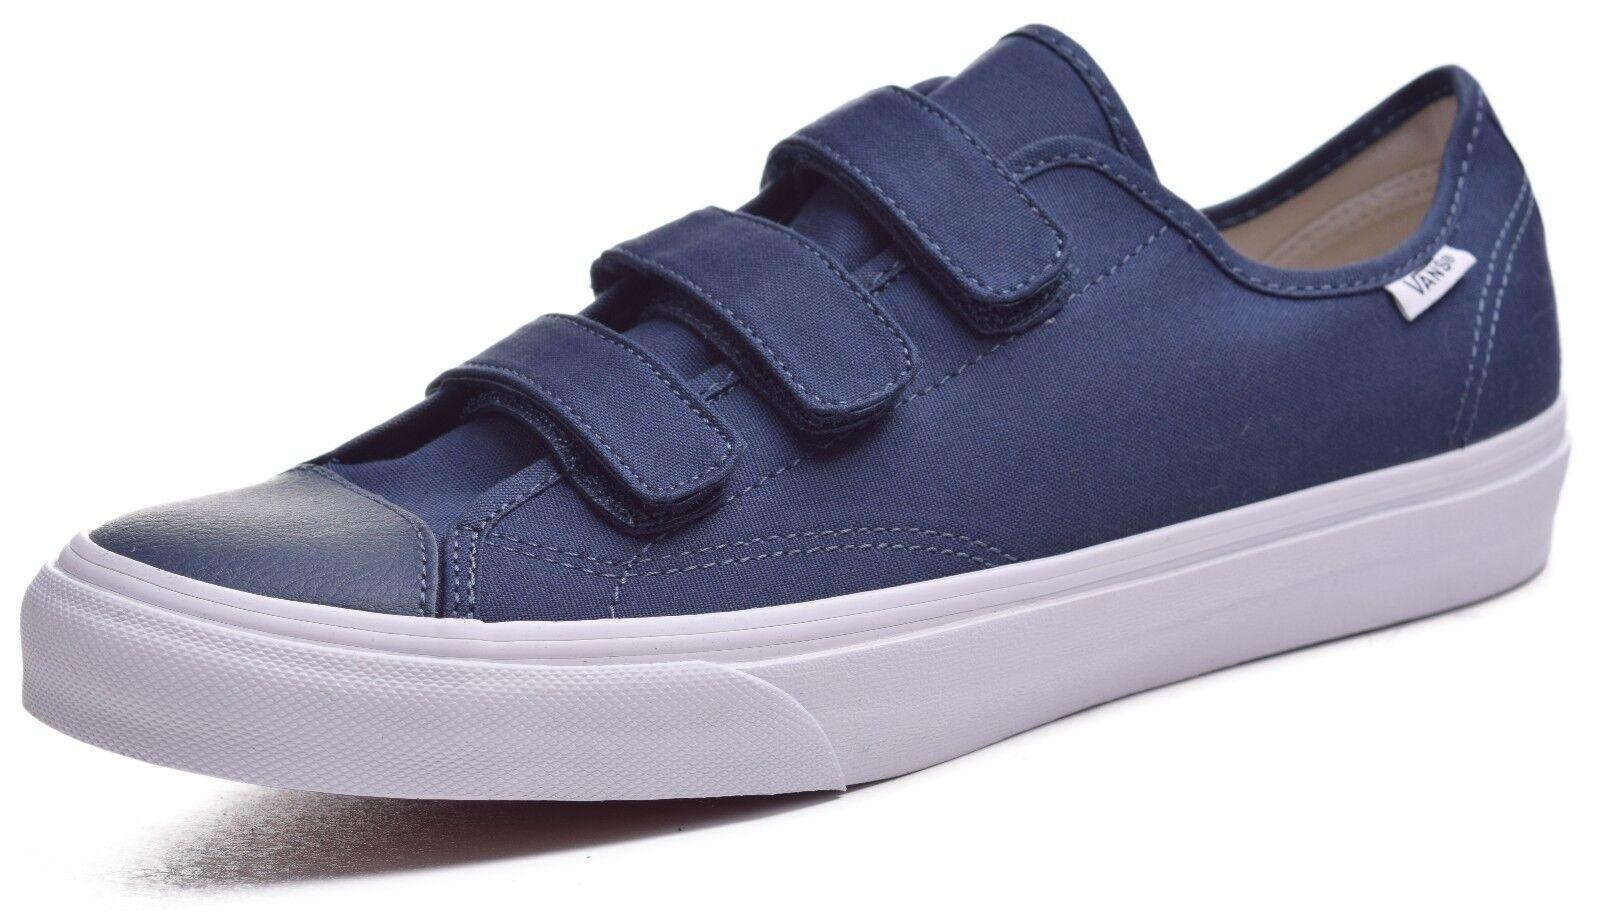 Vans Style 23 V Mens Canvas Canvas Canvas Leather Toe Navy Skateboard schuhe Größe 11 7648d5